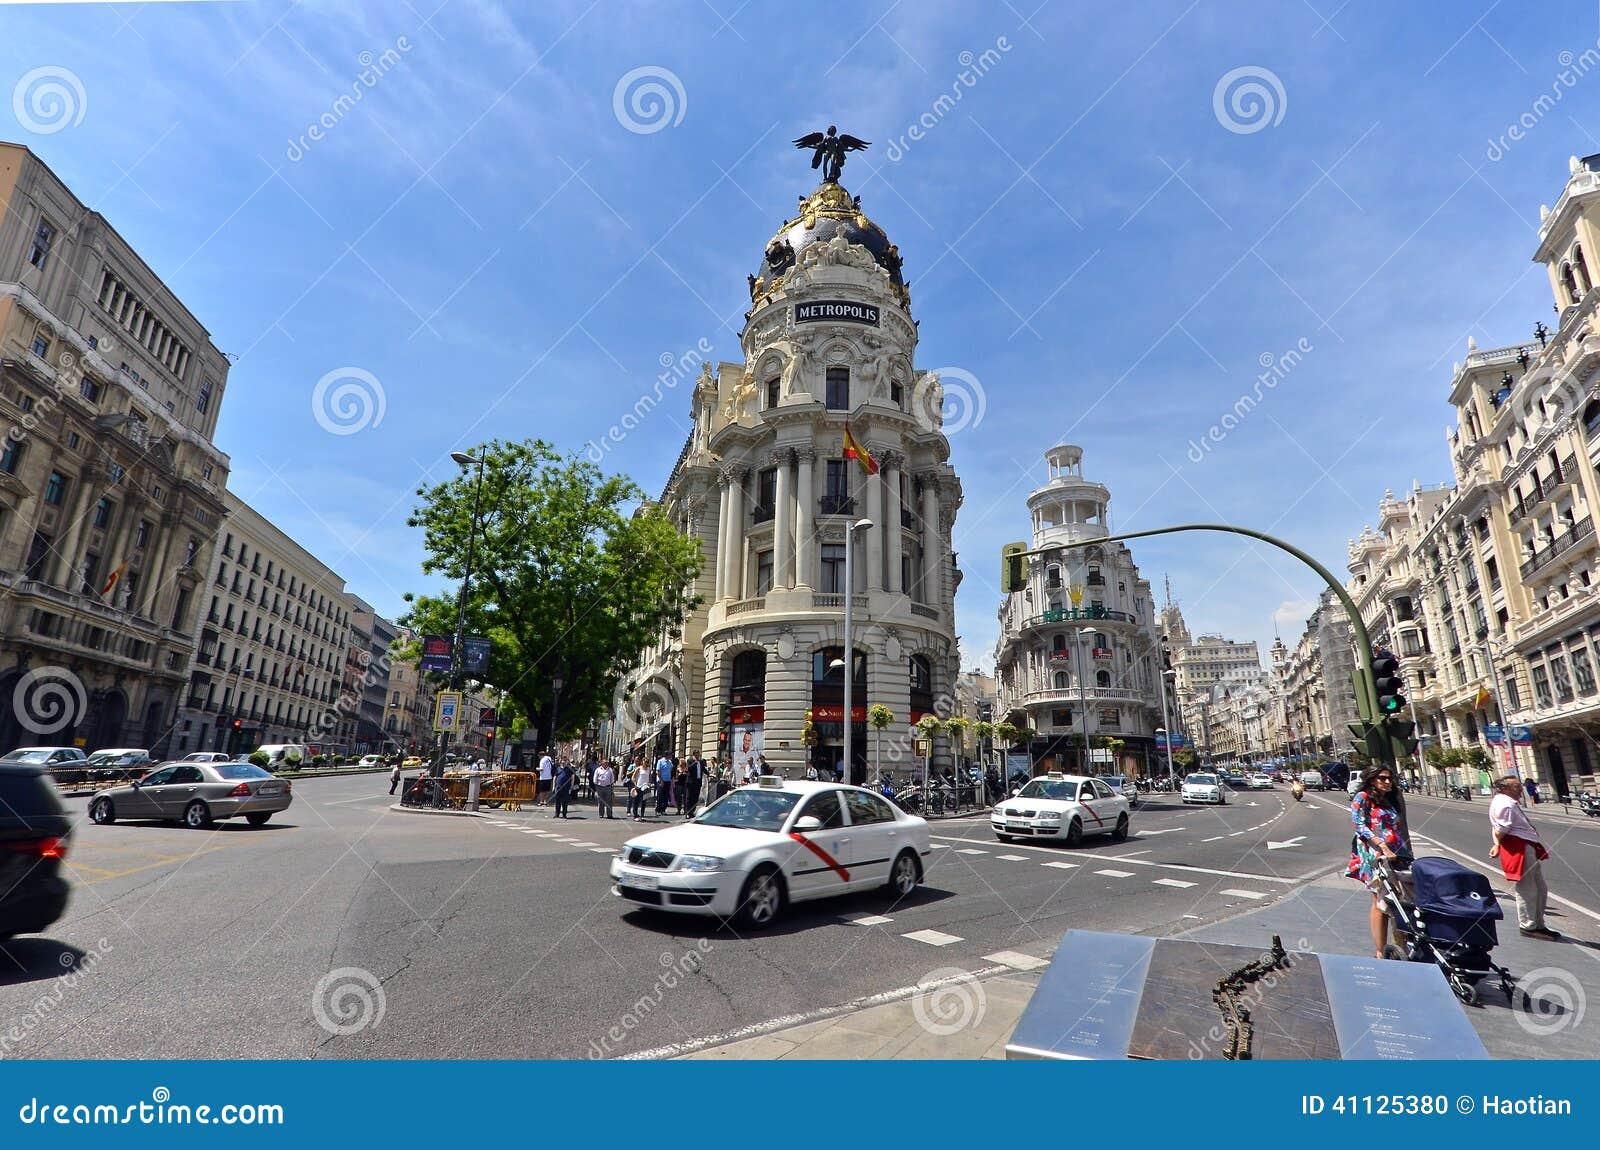 The famous Metropolis Building of Gran Via, Madrid